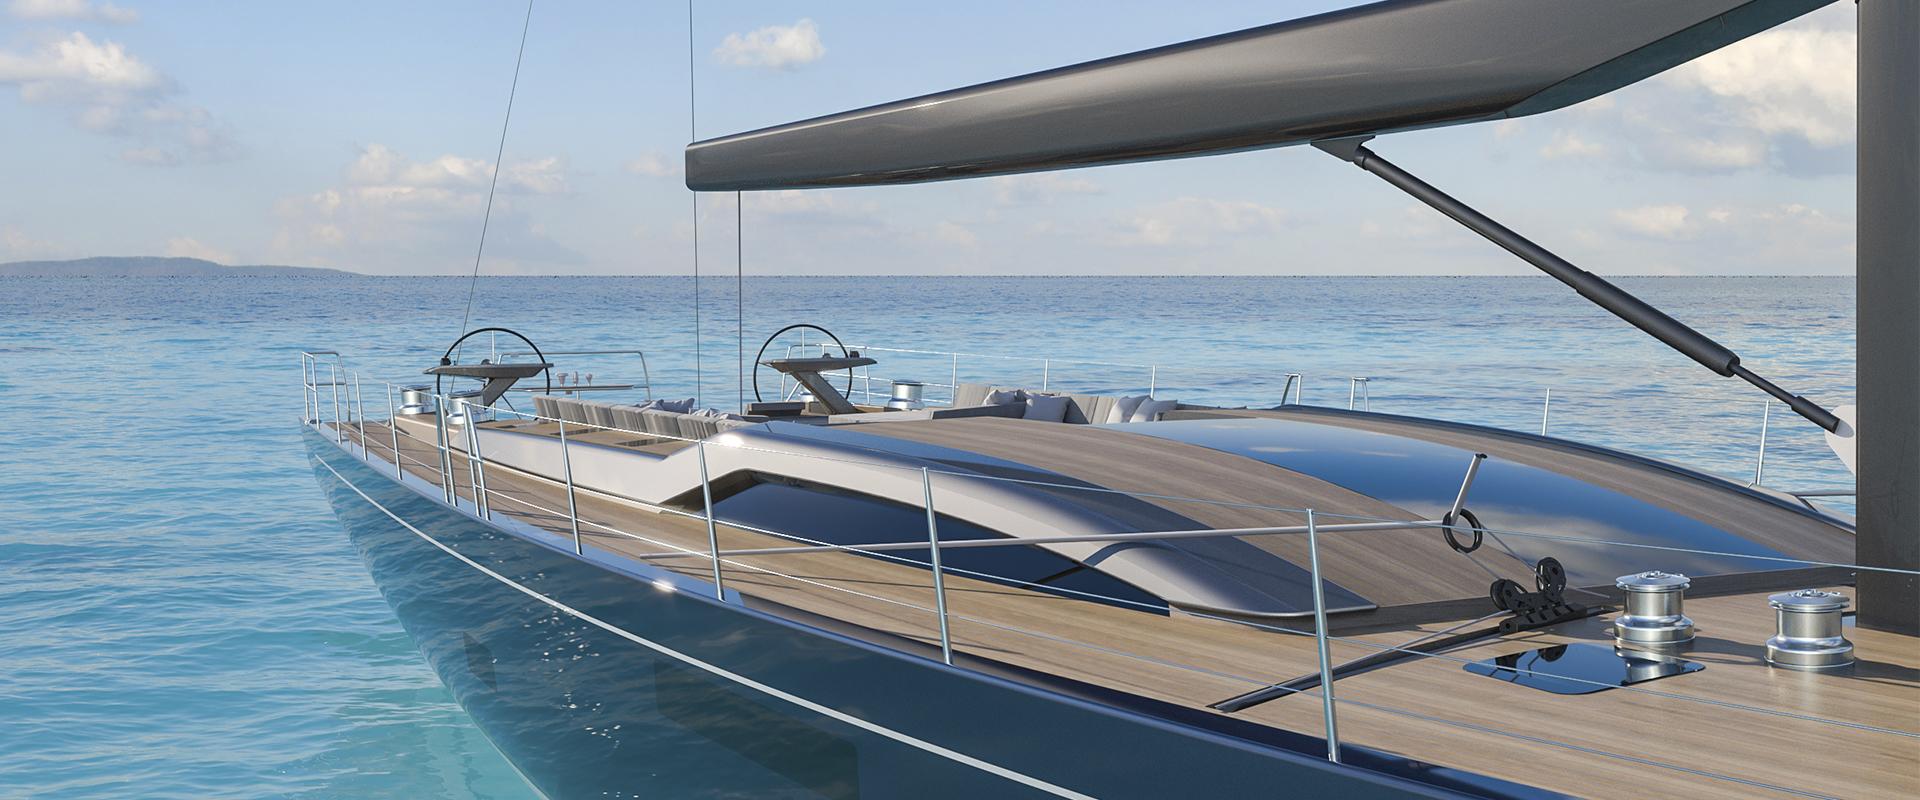 Rendering of SW108 HYRBID Sailing Yacht